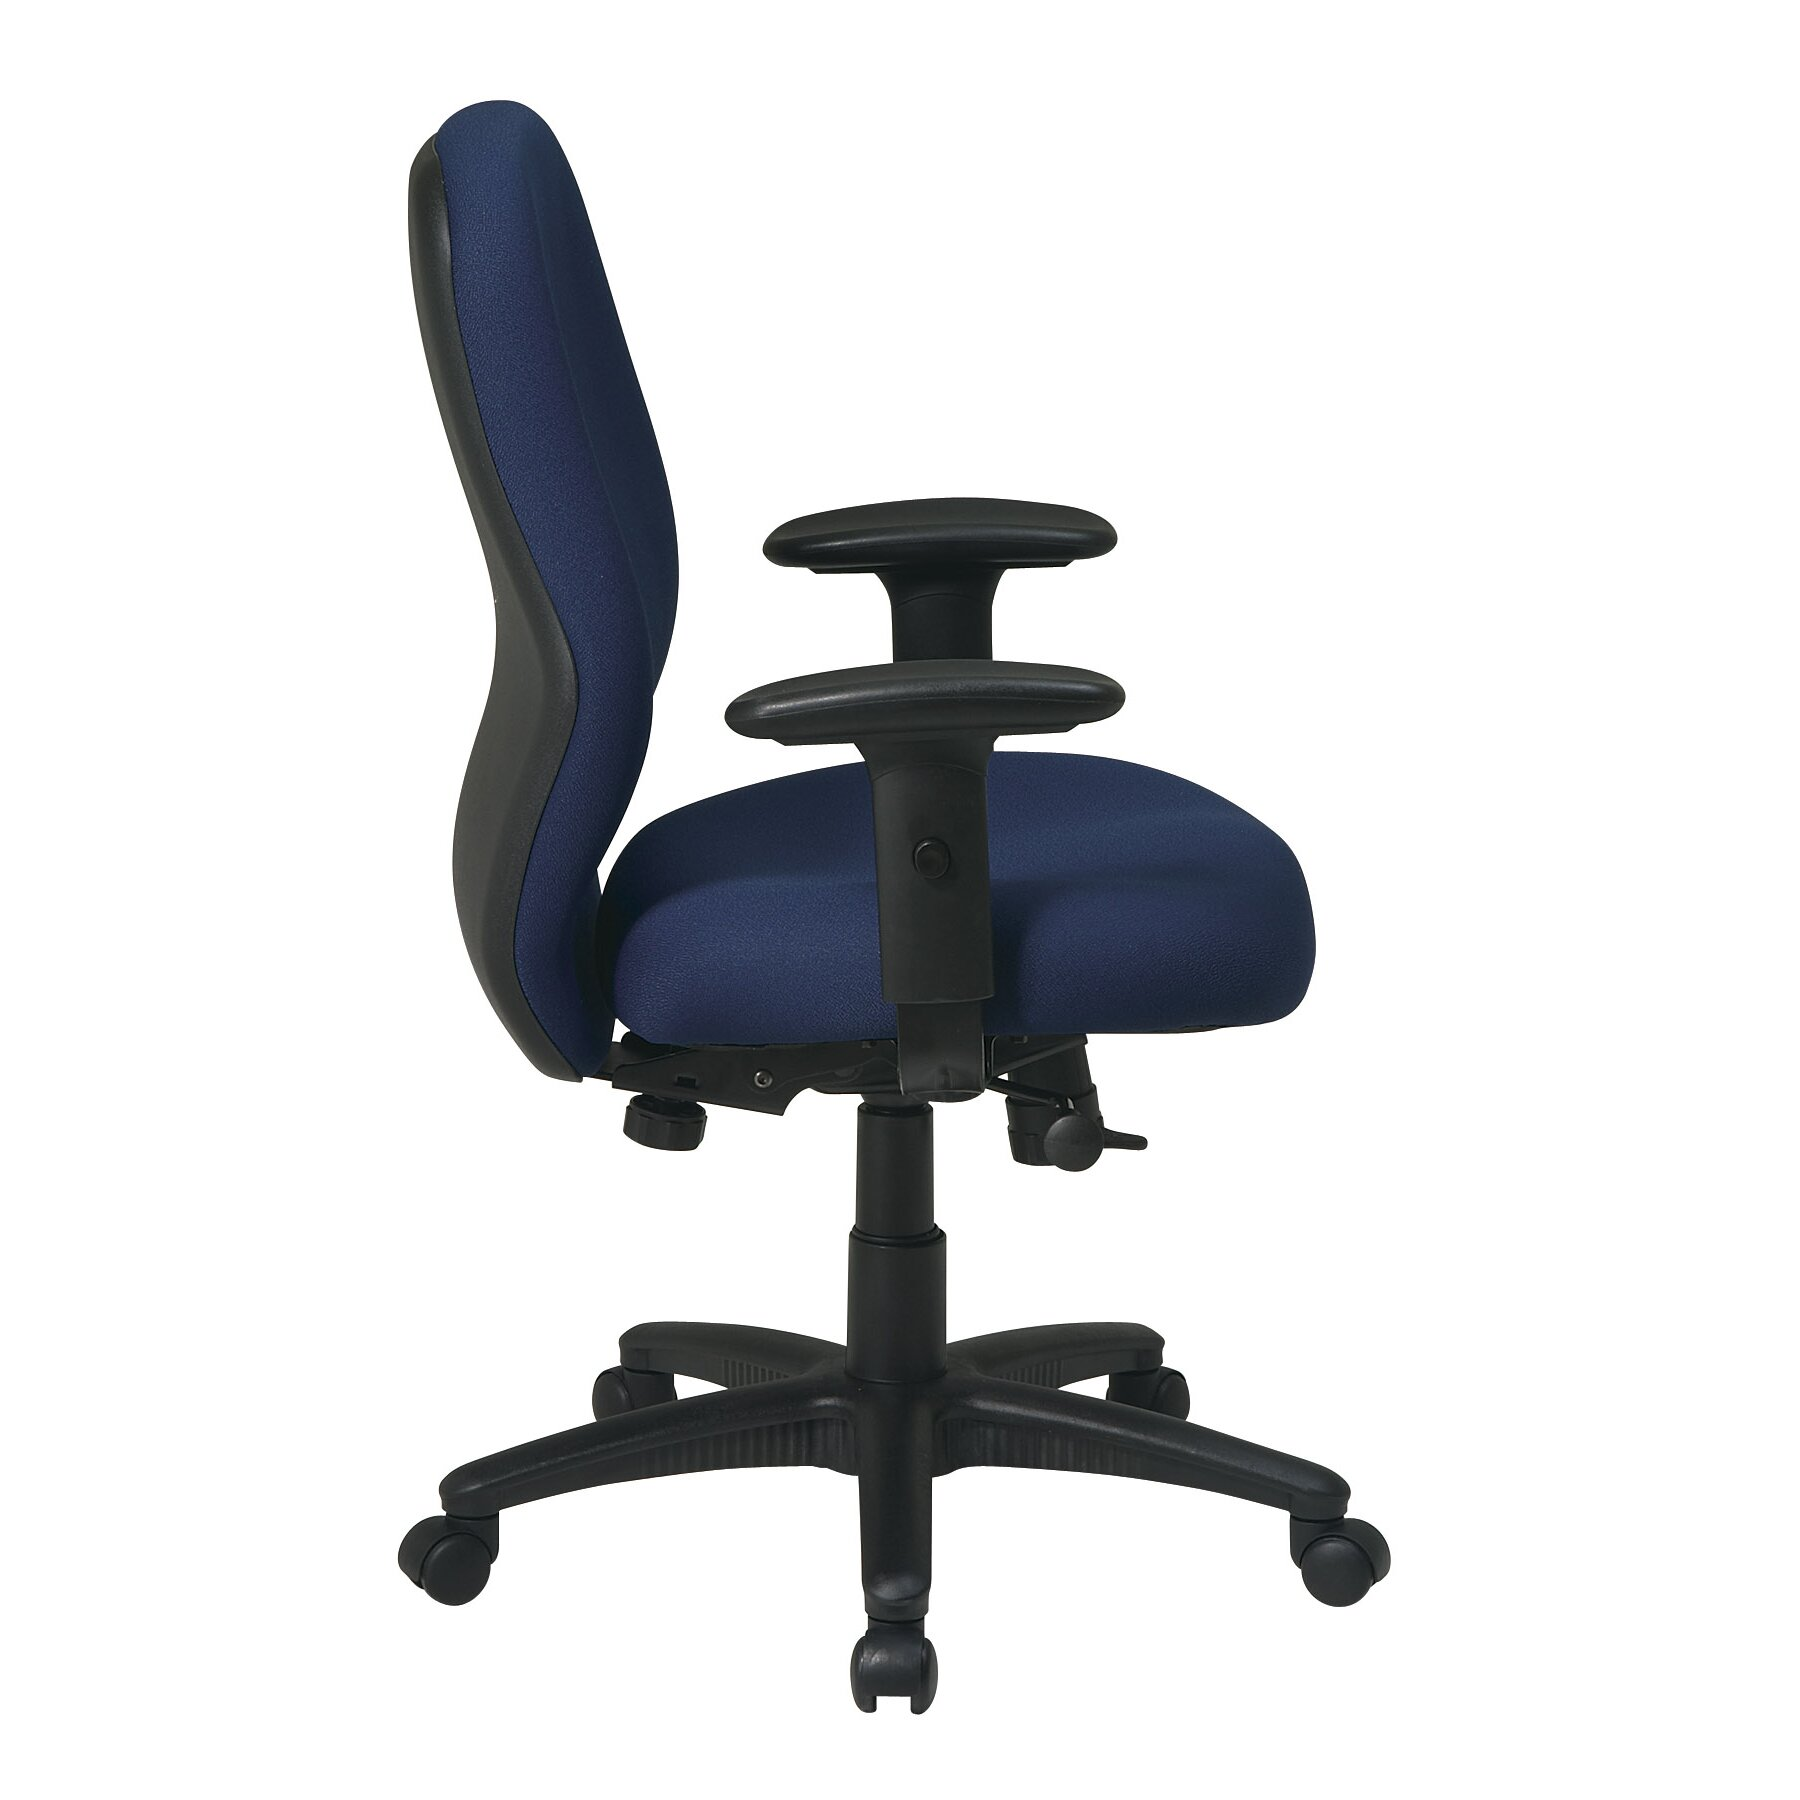 Office Star Work Smart Mid Back Desk Chair amp Reviews Wayfair : Mid2BBack2B2 to 12BSynchro2BTilt2BChair2Bwith2BAdjustable2BSoft2BPU2BPadded2BArms2B2528special2Border2529 from www.wayfair.com size 1800 x 1800 jpeg 171kB